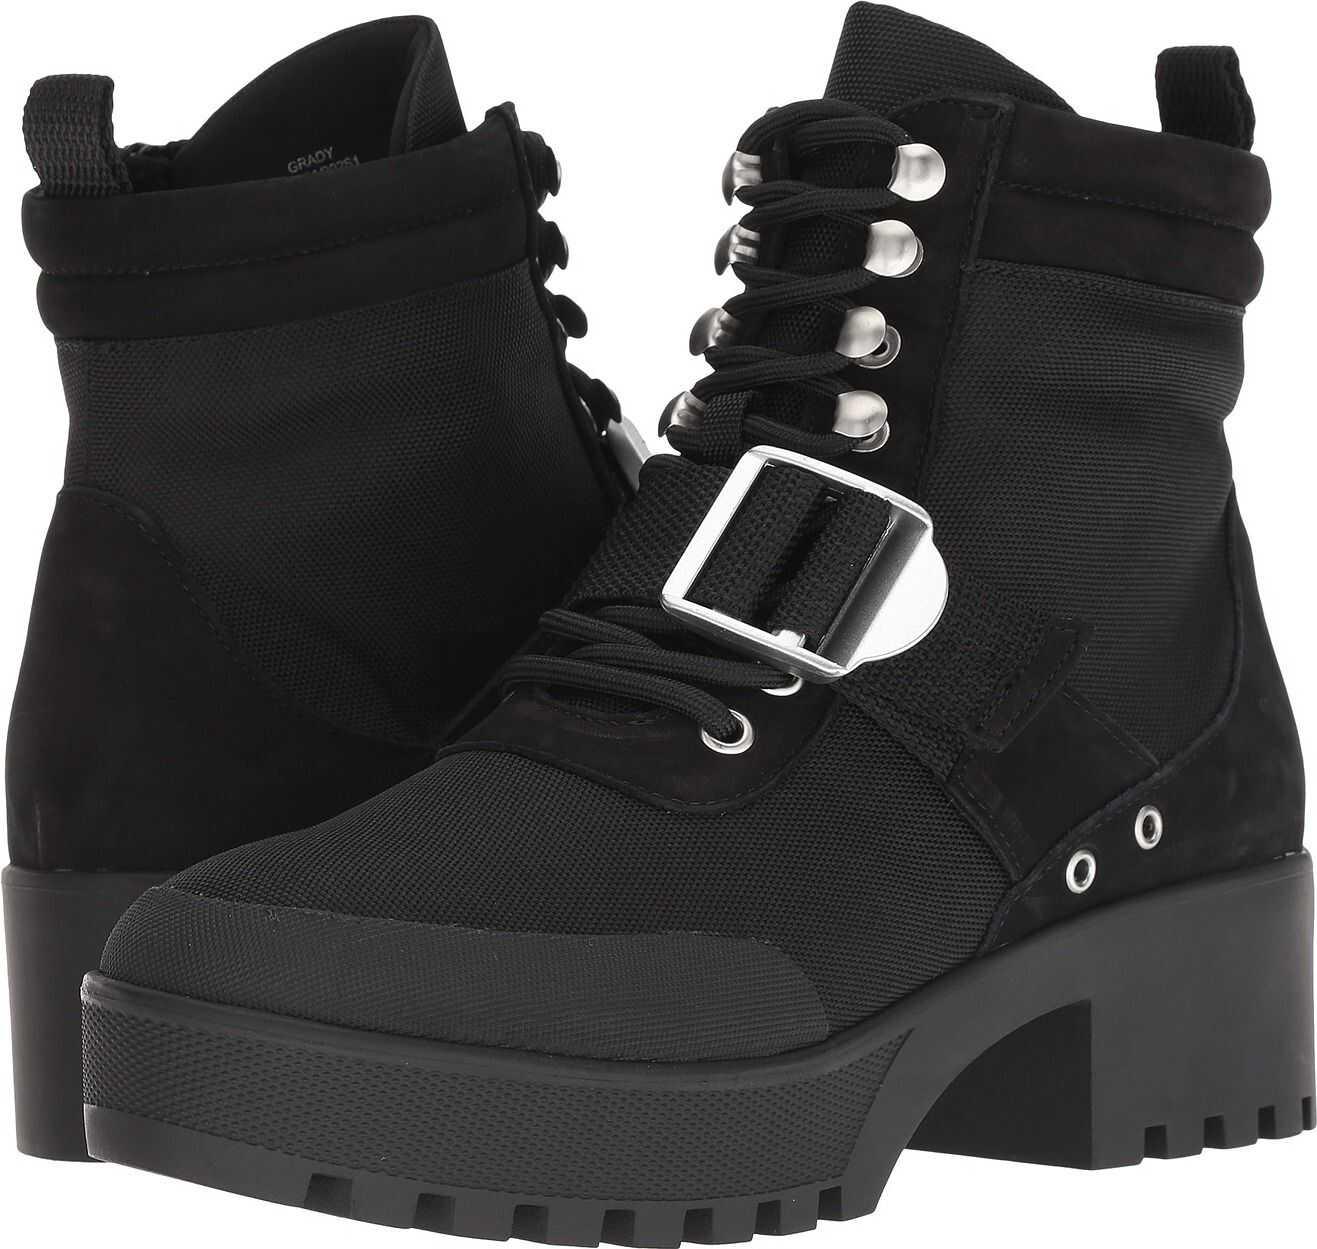 Steve Madden Grady Hiker Boot Black Multi